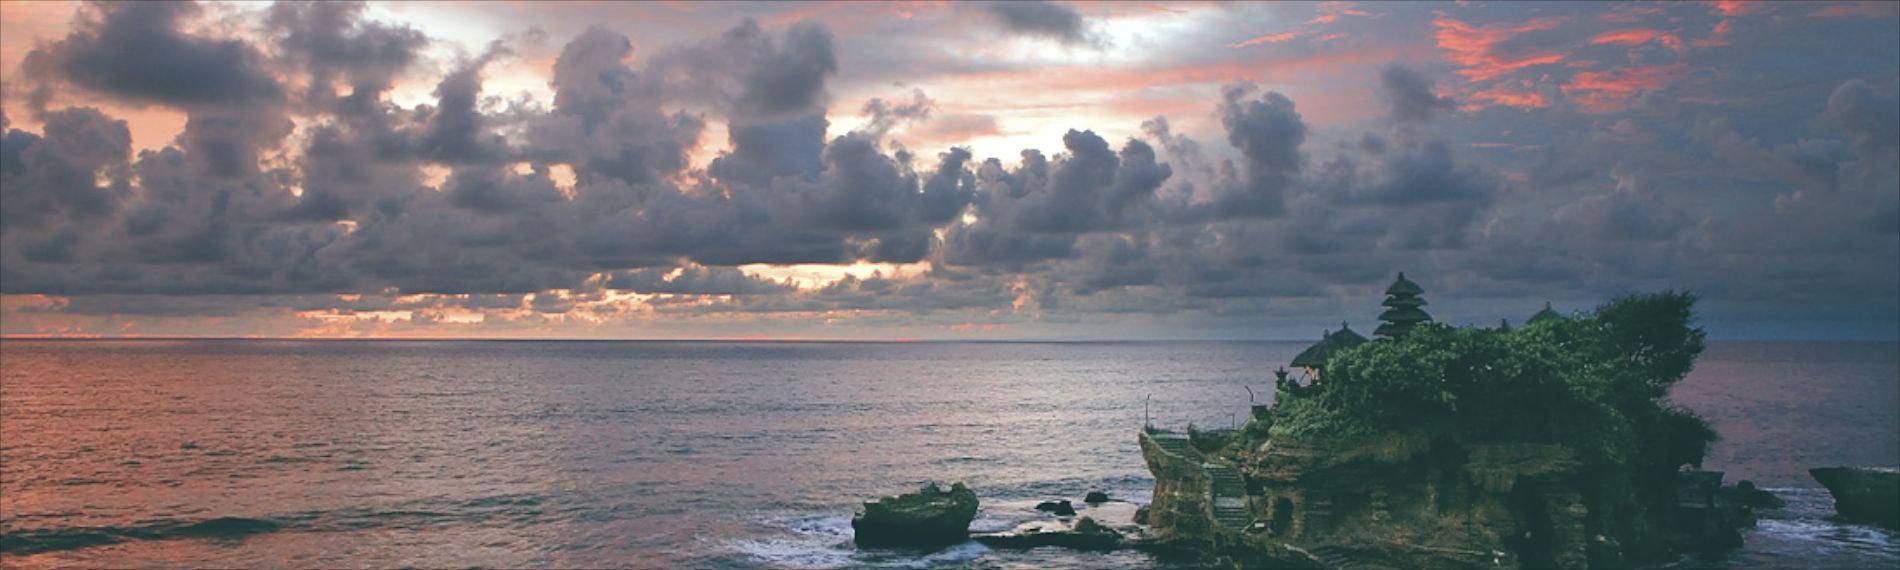 https://mlcb8szwyxfv.i.optimole.com/tTCGqh8-V4Bde9xu/w:auto/h:auto/q:90/https://www.uniqueteambuilding.com.au/wp-content/uploads/2014/10/Bali-retreat-rot-4.jpg